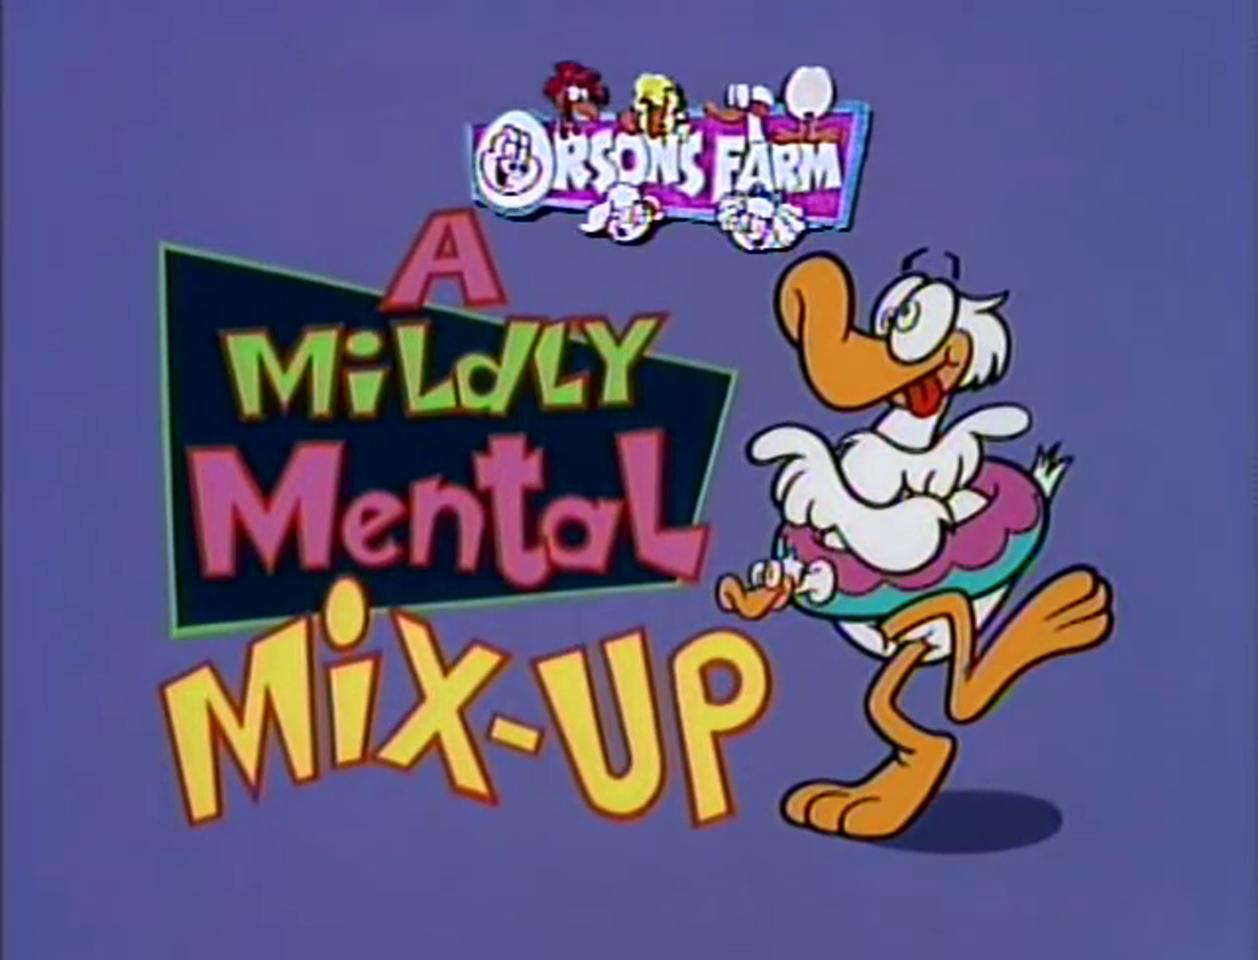 A Mildly Mental Mix-Up